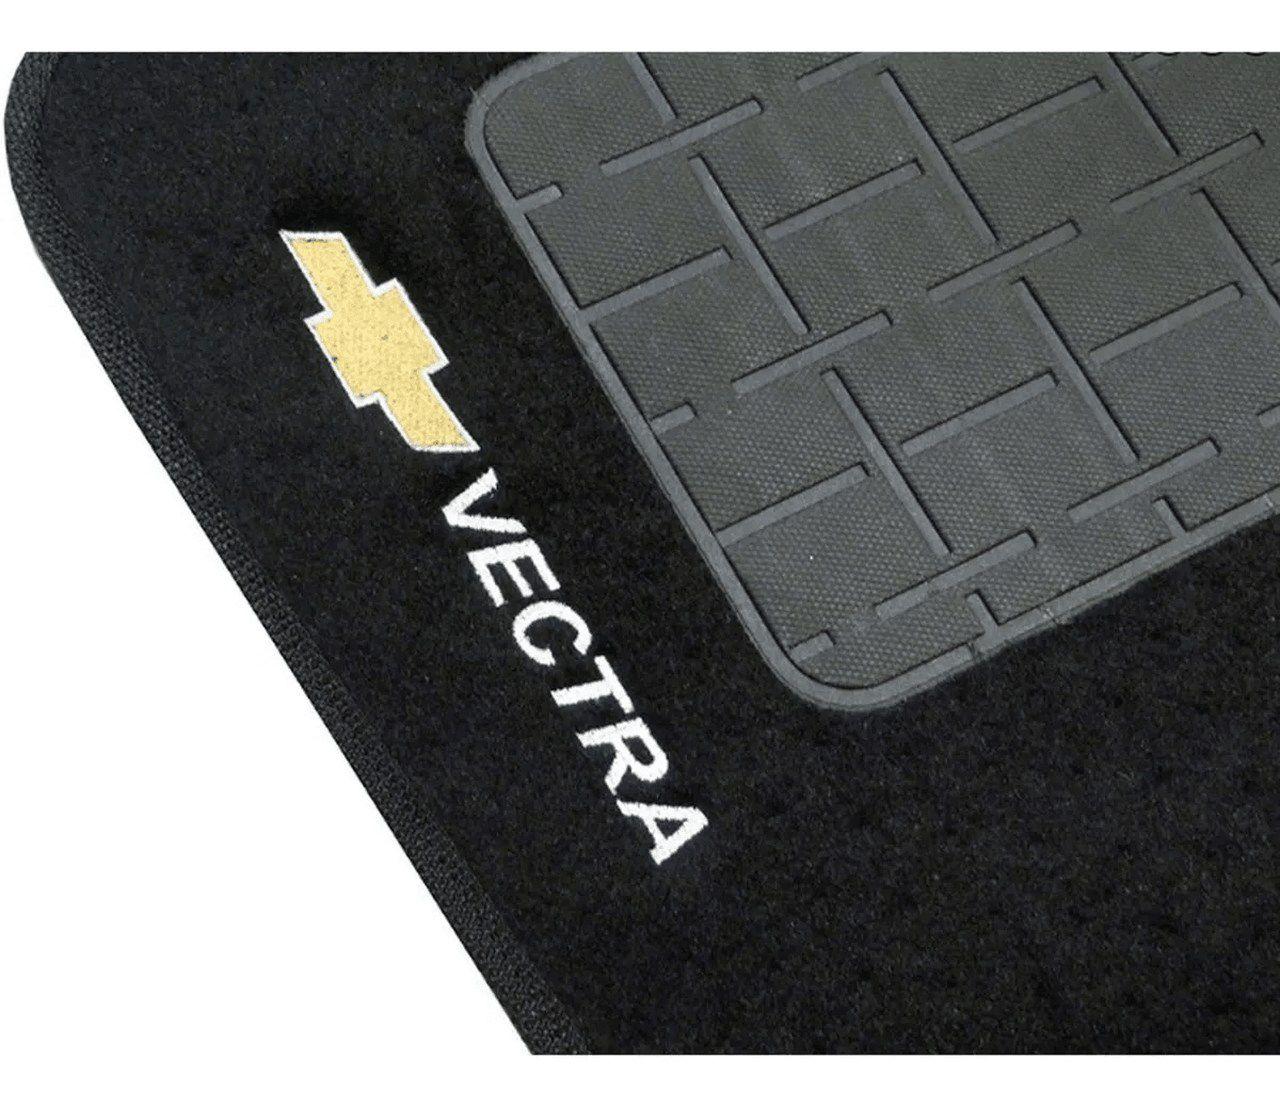 Jogo De Tapete Carpete Chevrolet Vectra 1997 à 2005 5 Peças